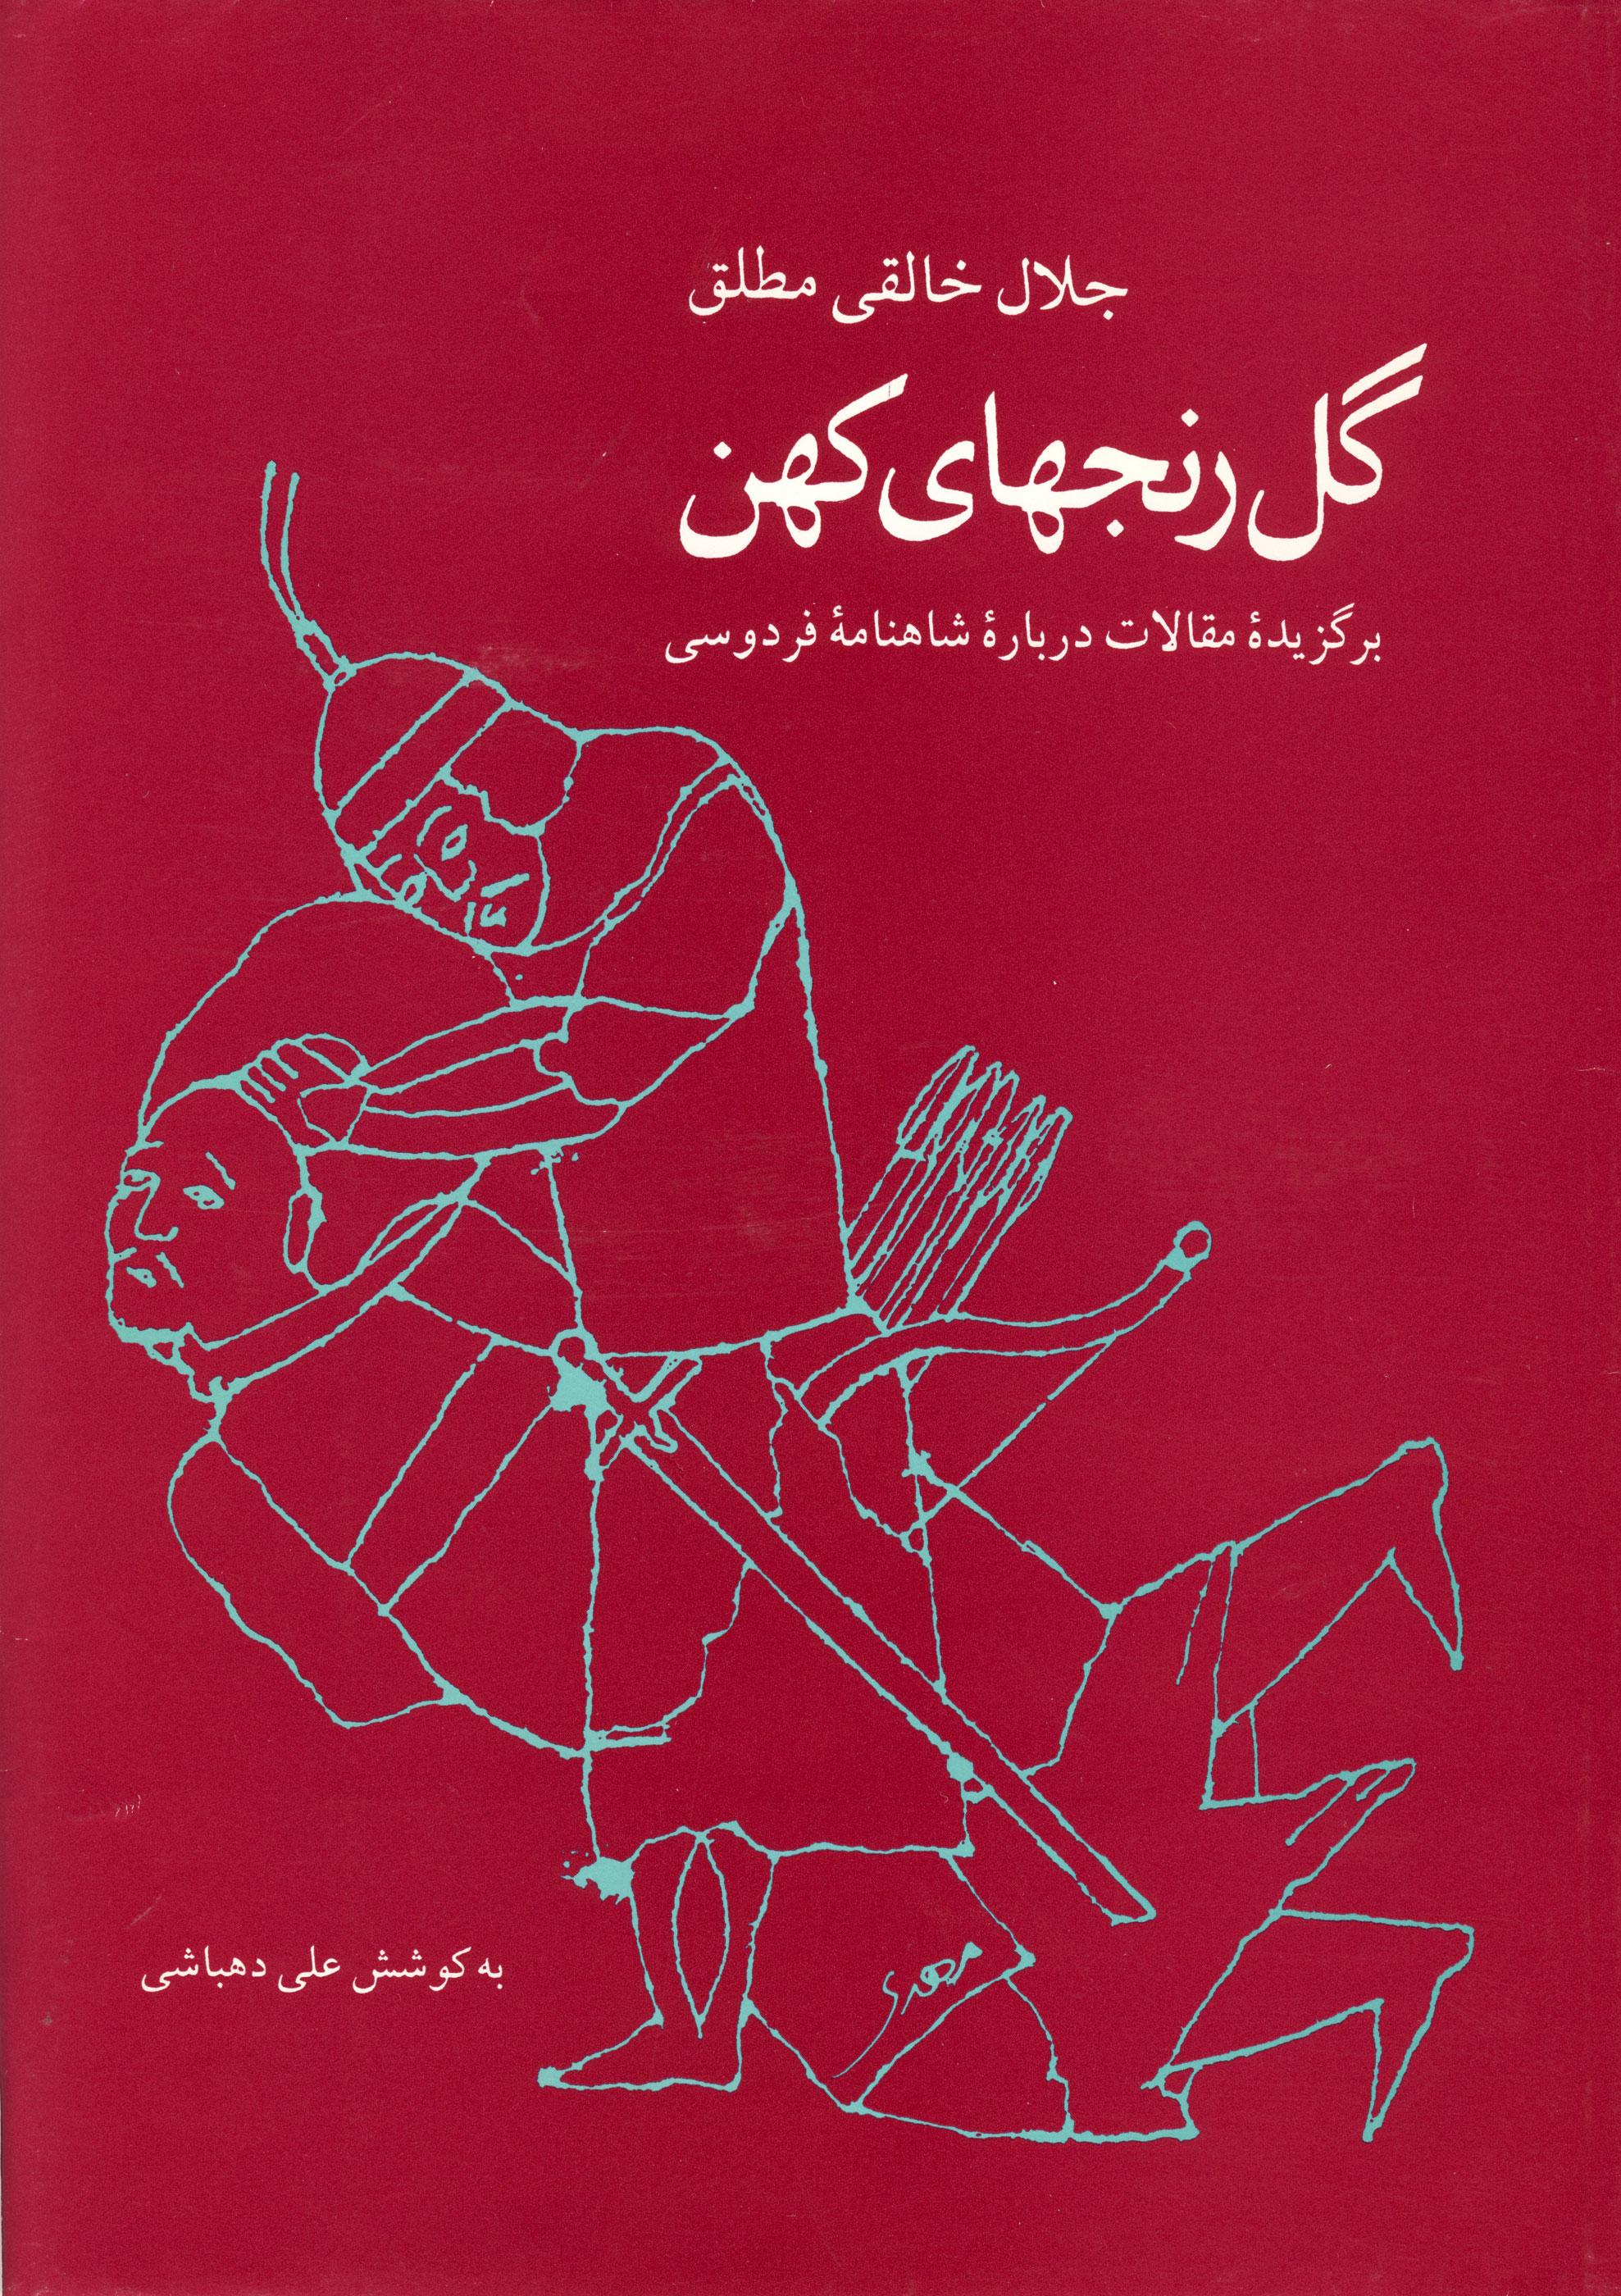 Khaleghi